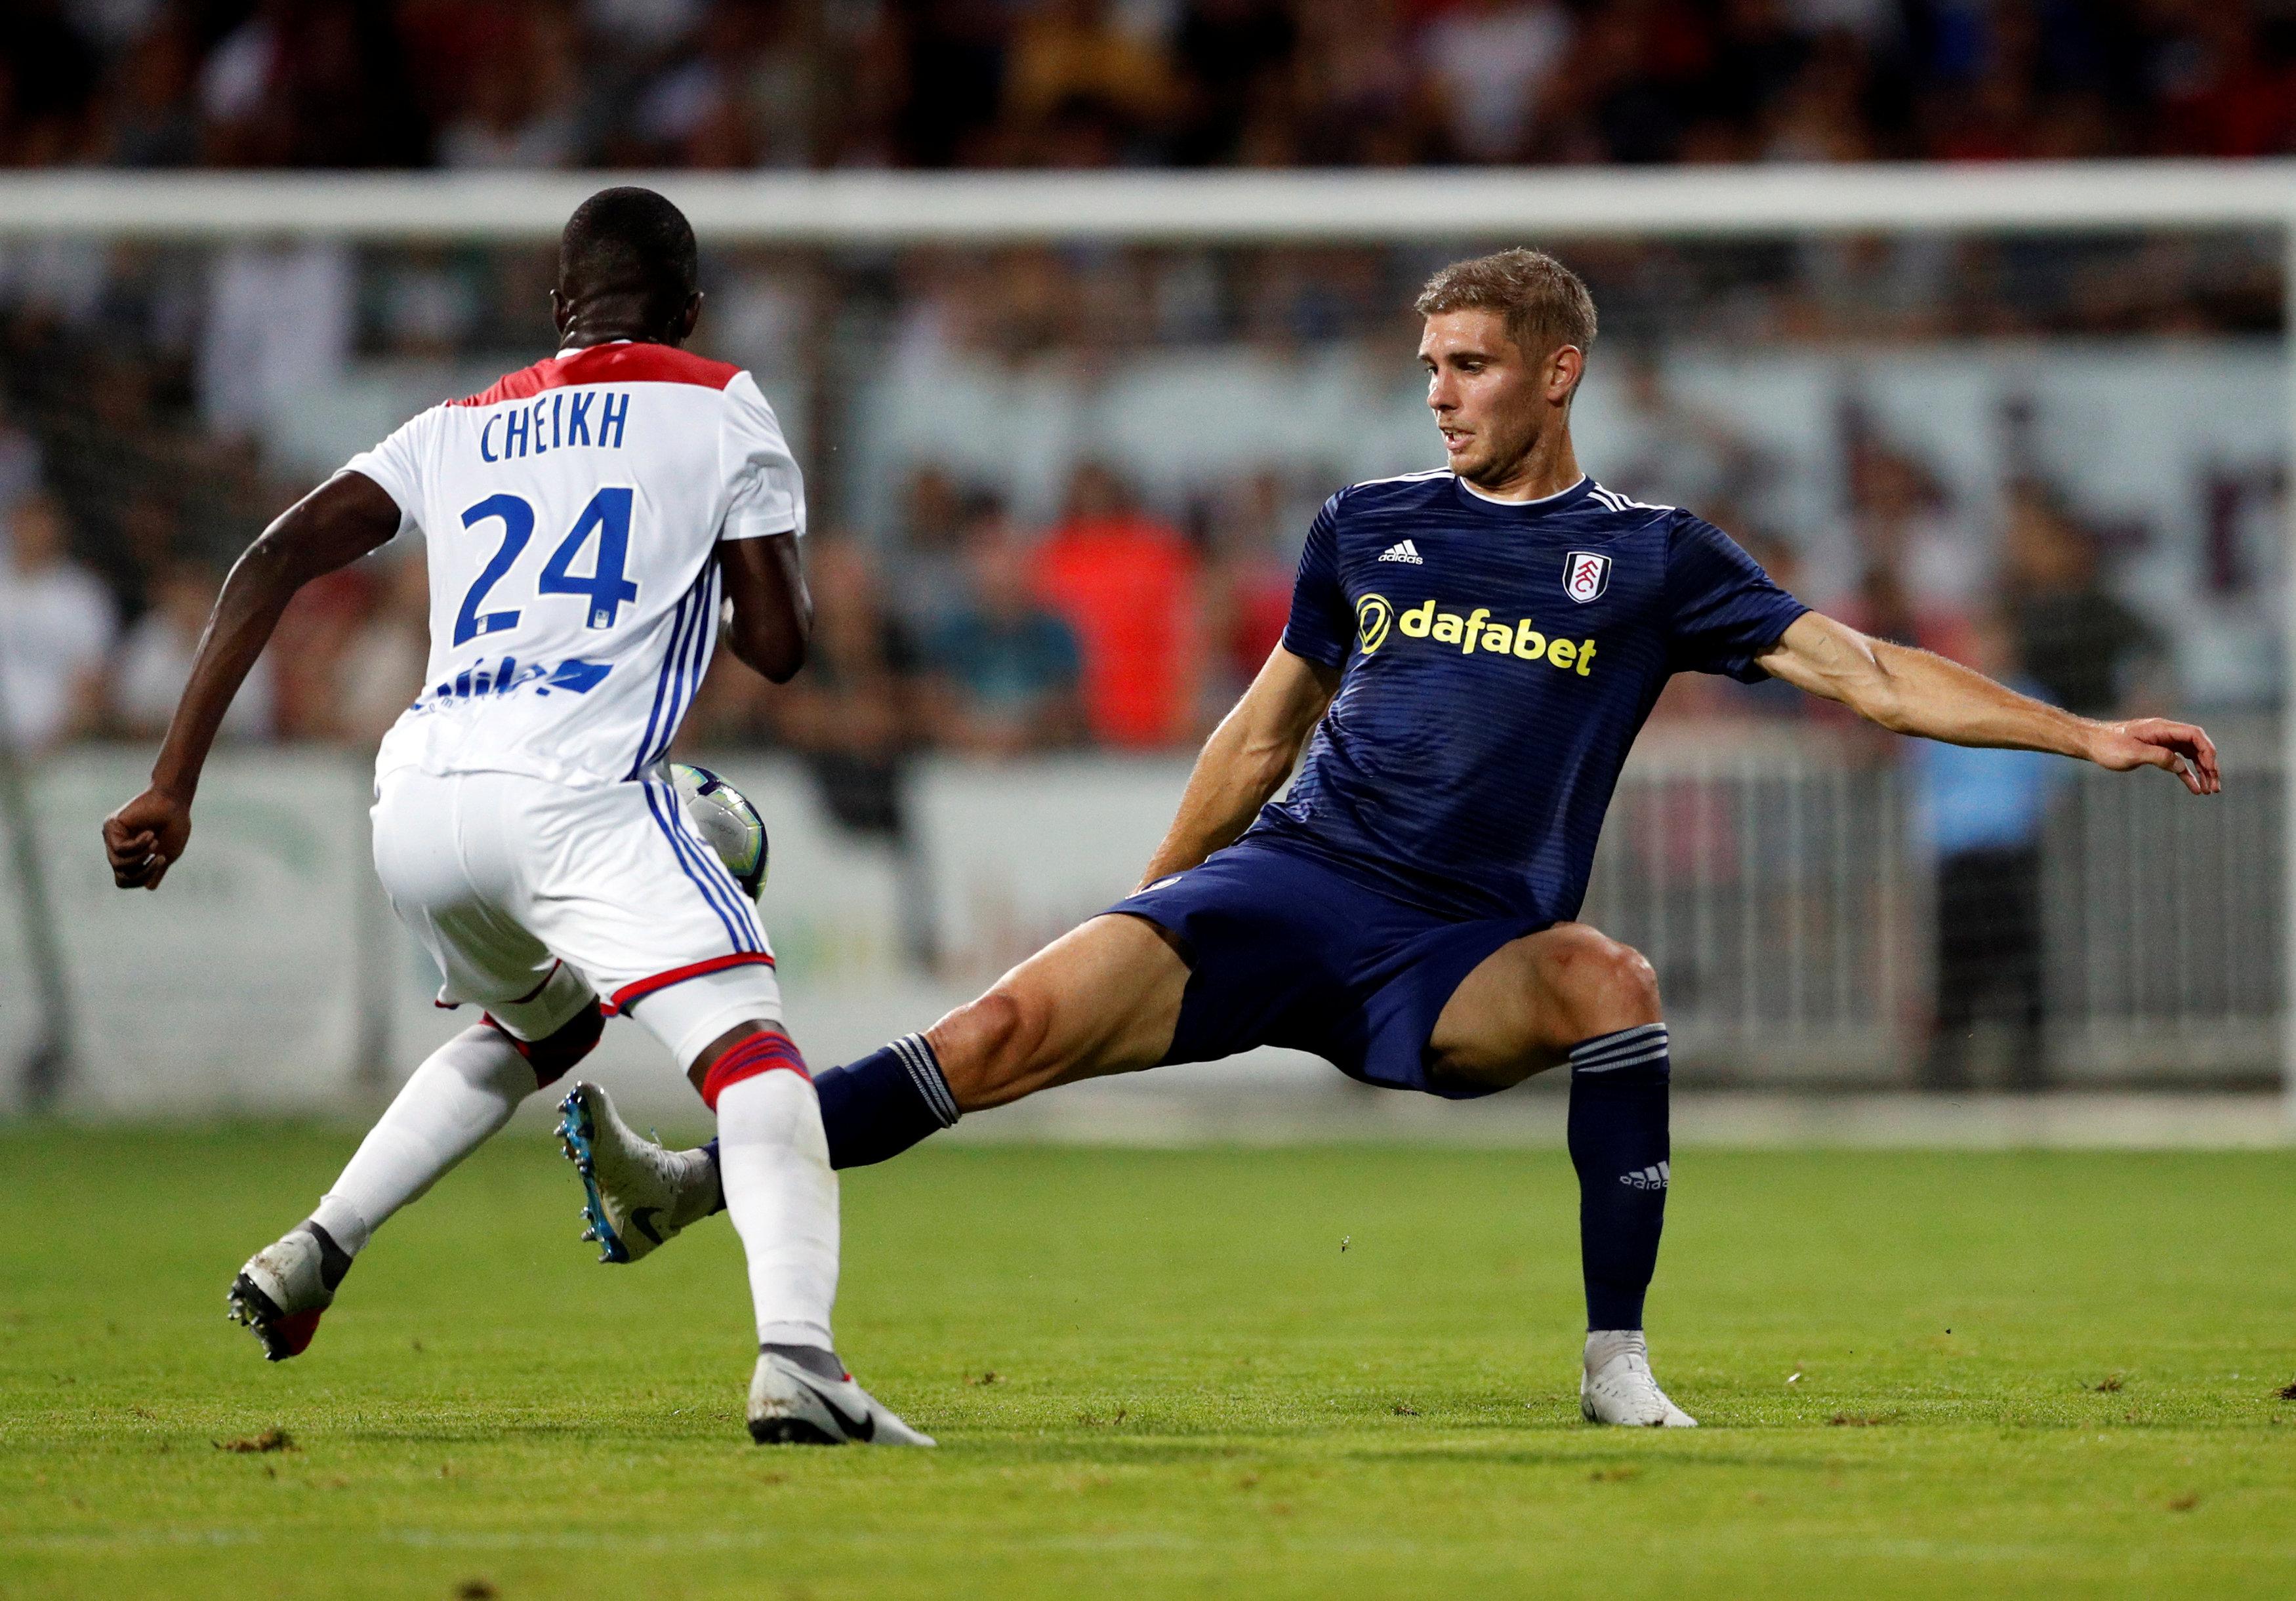 Fulham squad 2018 2019 Maxime Le Marchand